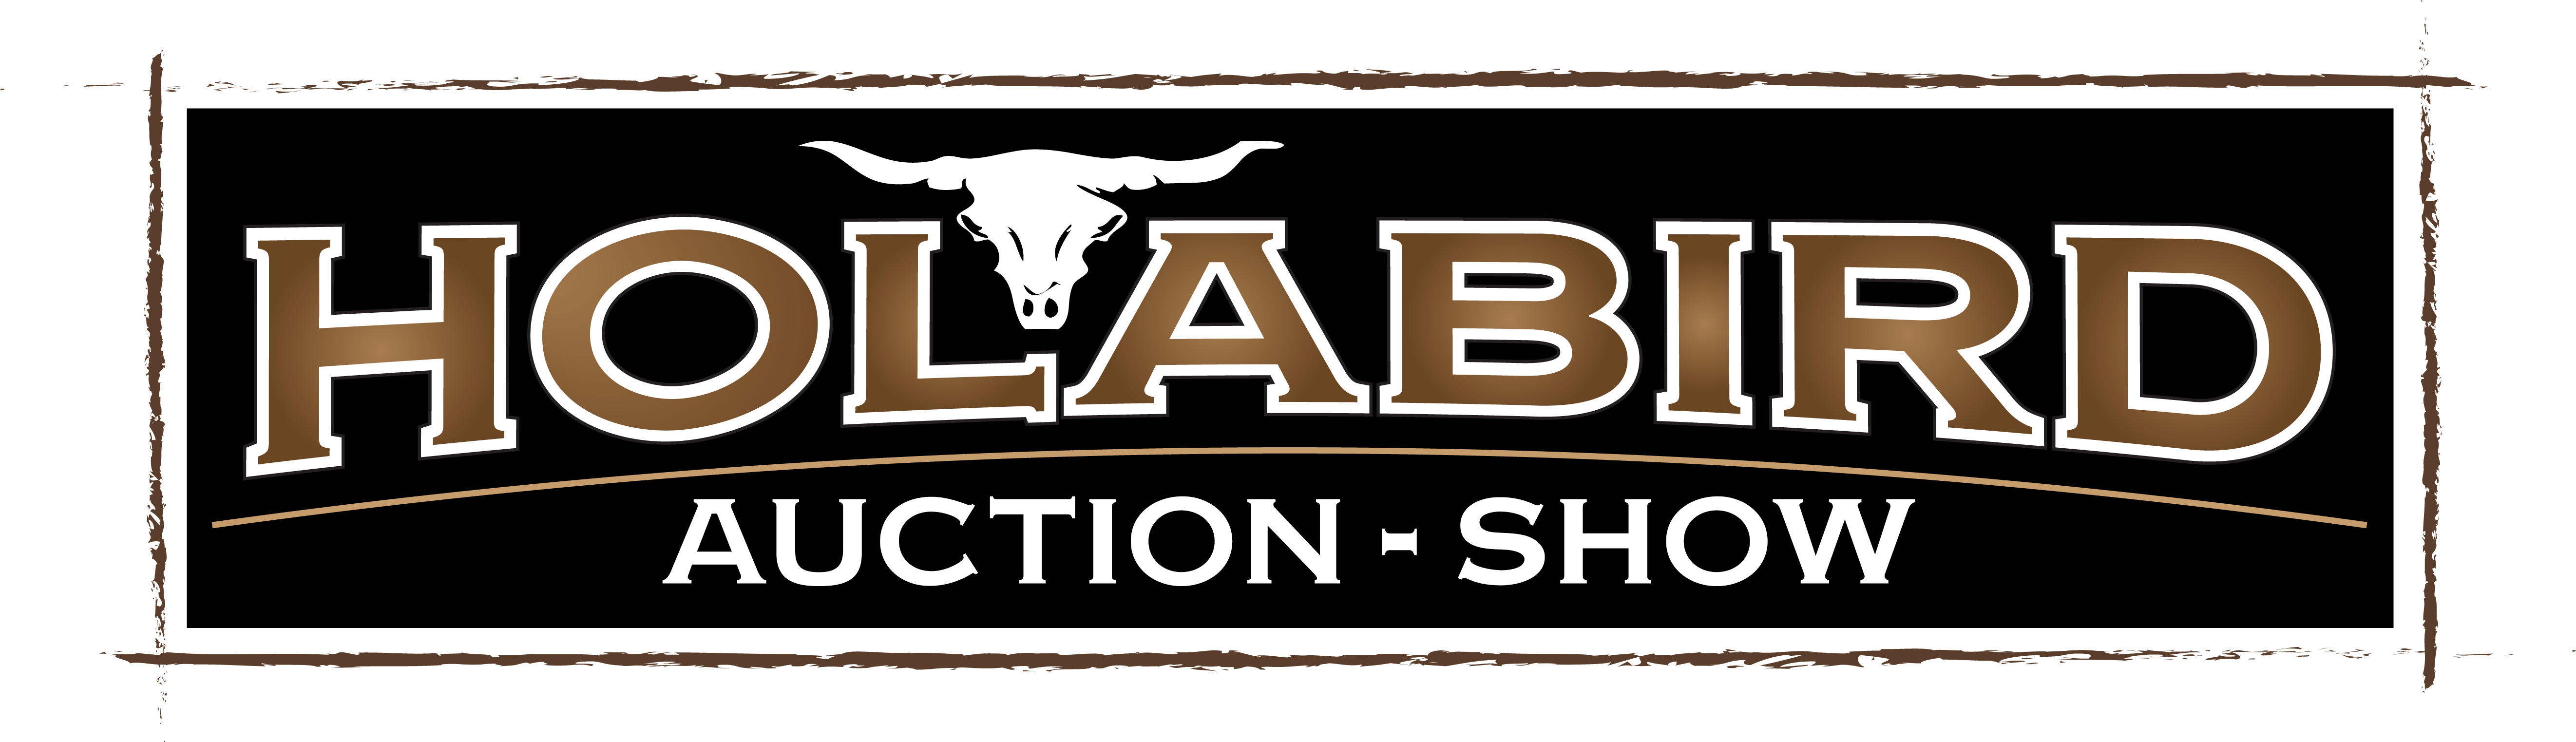 Holabird Auction Show